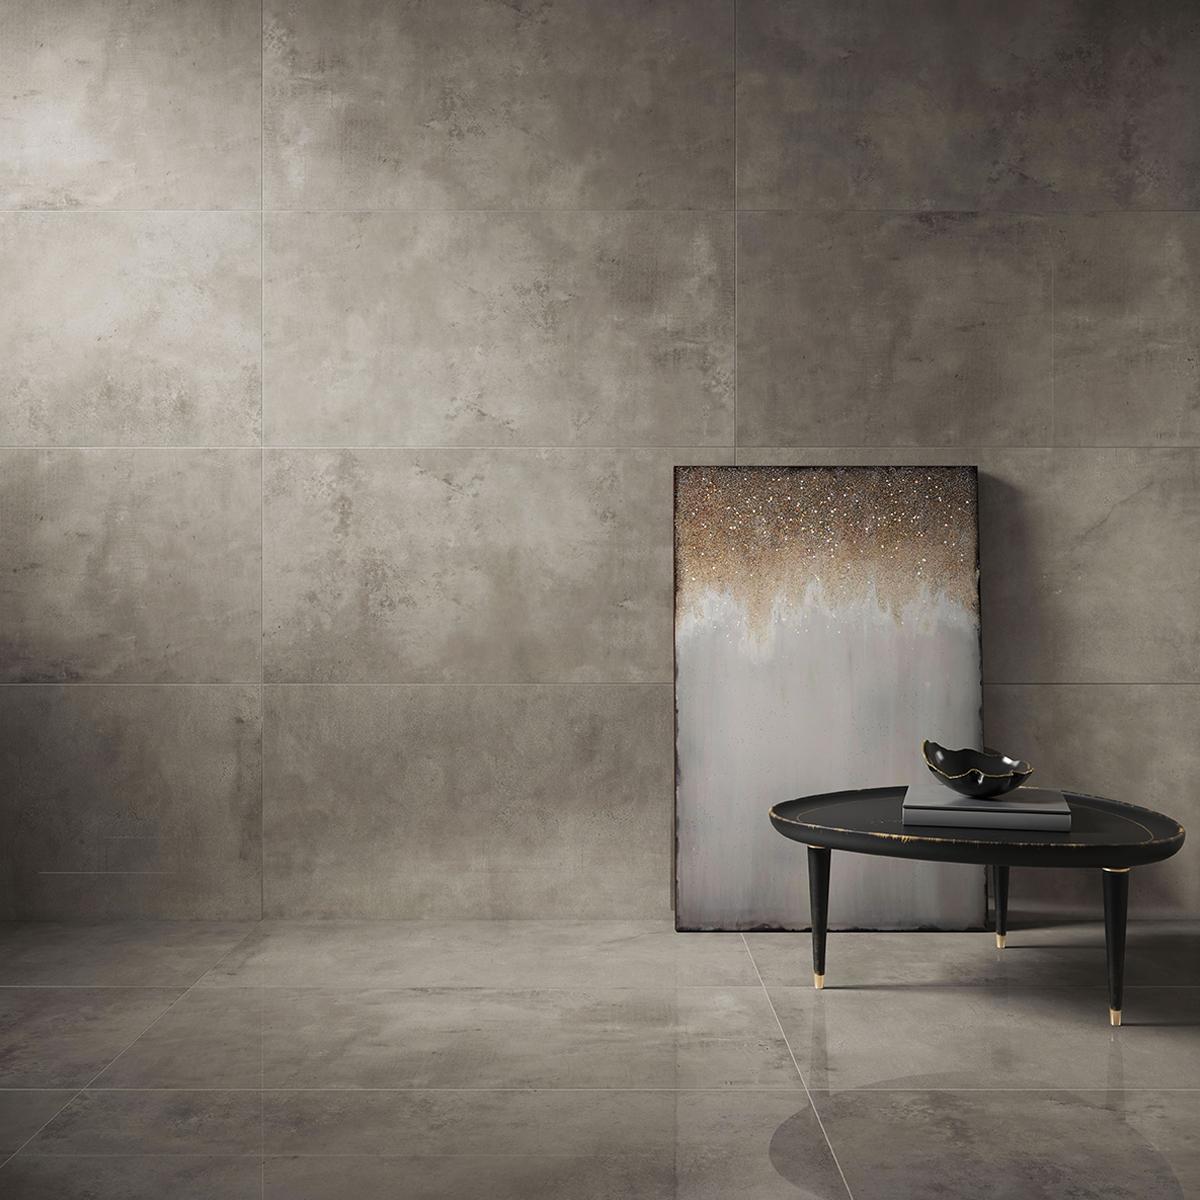 Porcelanato Concreto Aparente Gris Brillante - 59X59 cm - 1.39 m2